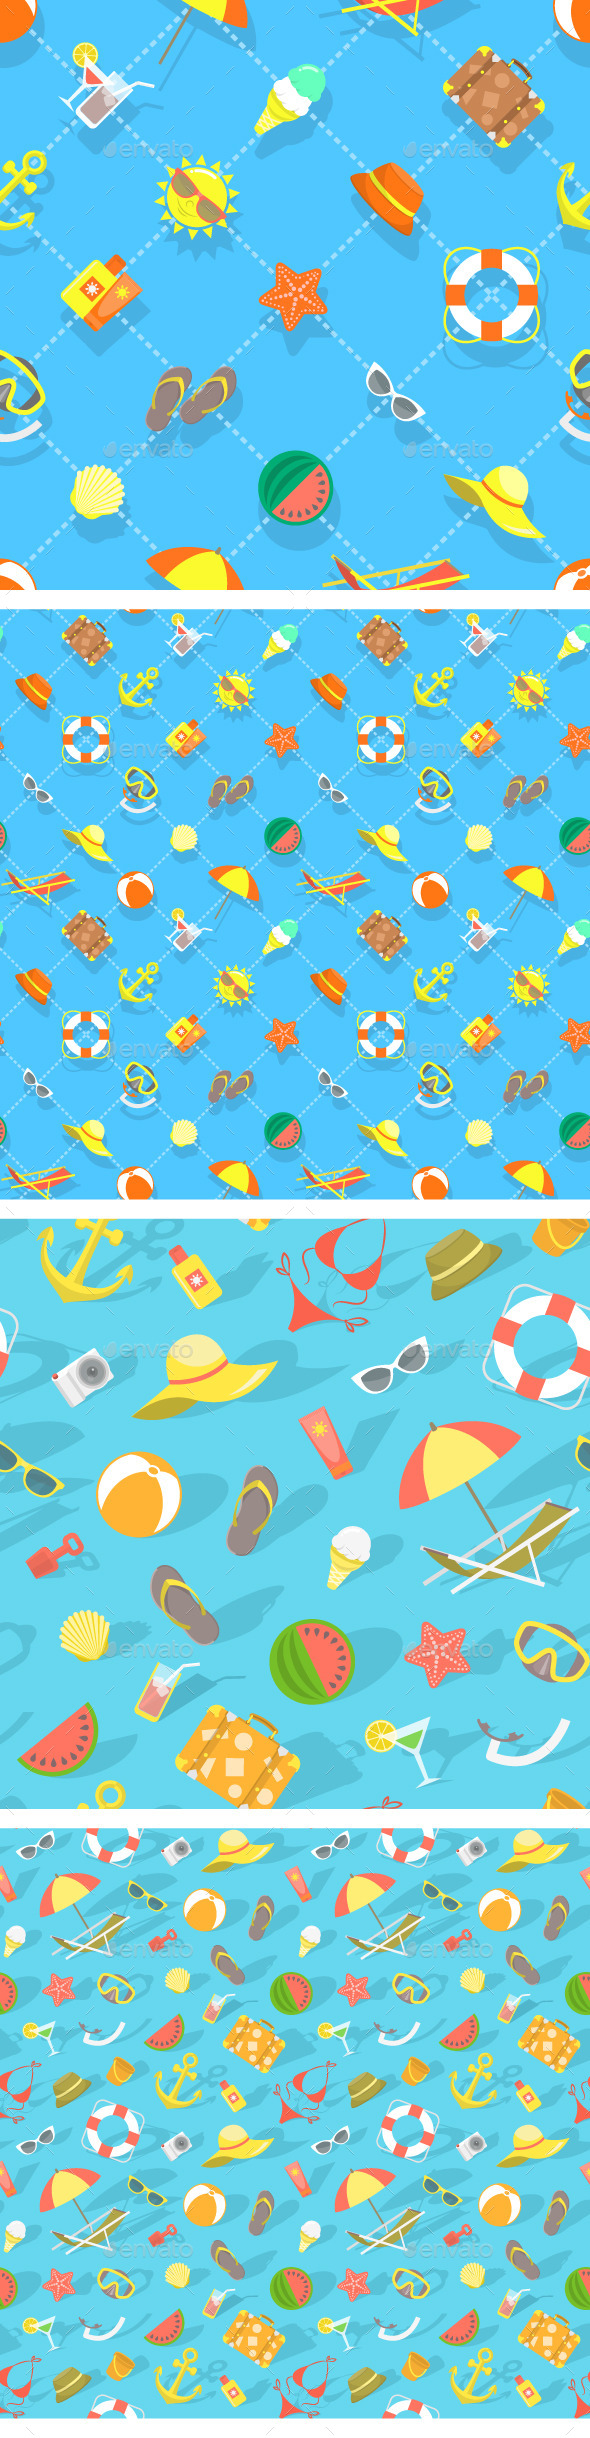 Summer Vacation Beach Icons Flat Seamless Pattern - Patterns Decorative